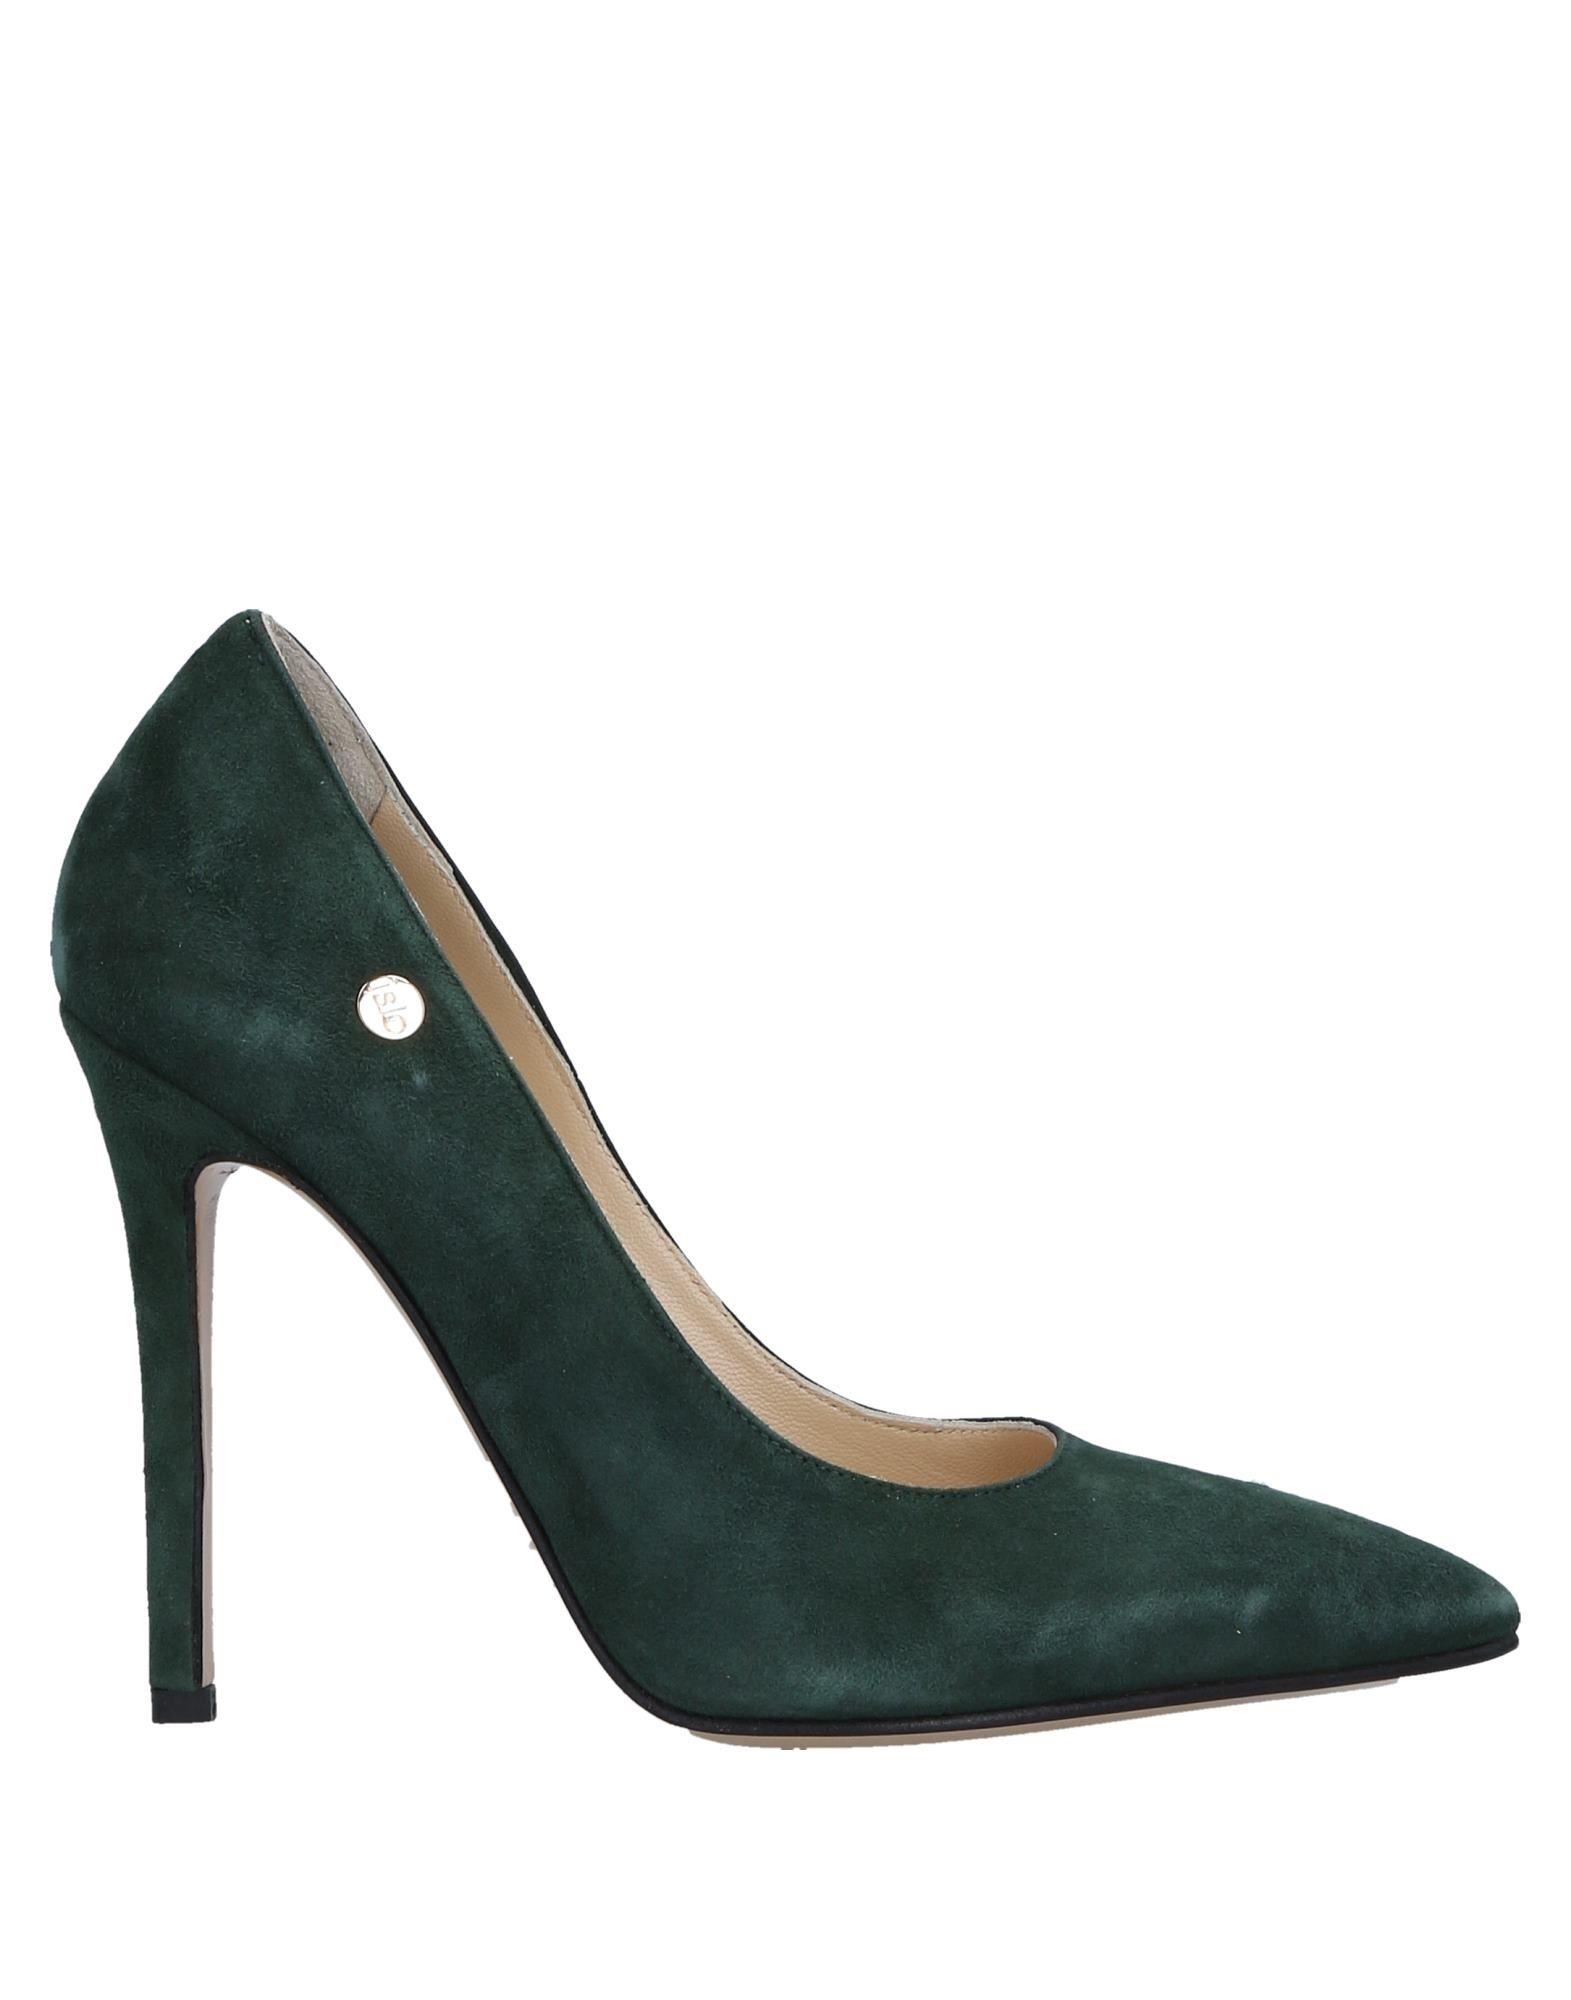 Islo Isabella Lorusso Pumps Damen  Schuhe 11239072NN Gute Qualität beliebte Schuhe  cc43b0